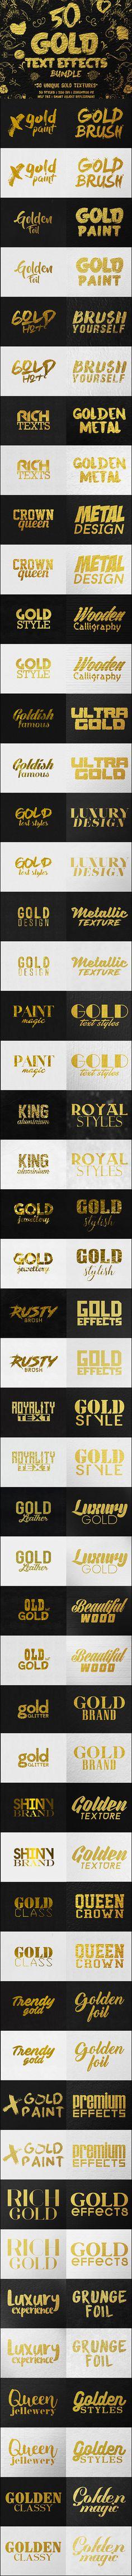 50 Gold Text Effects Bundle  Download 50 unique gold text textures here: https://graphicriver.net/item/50-gold-text-effects-bundle/17432824?ref=KlitVogli